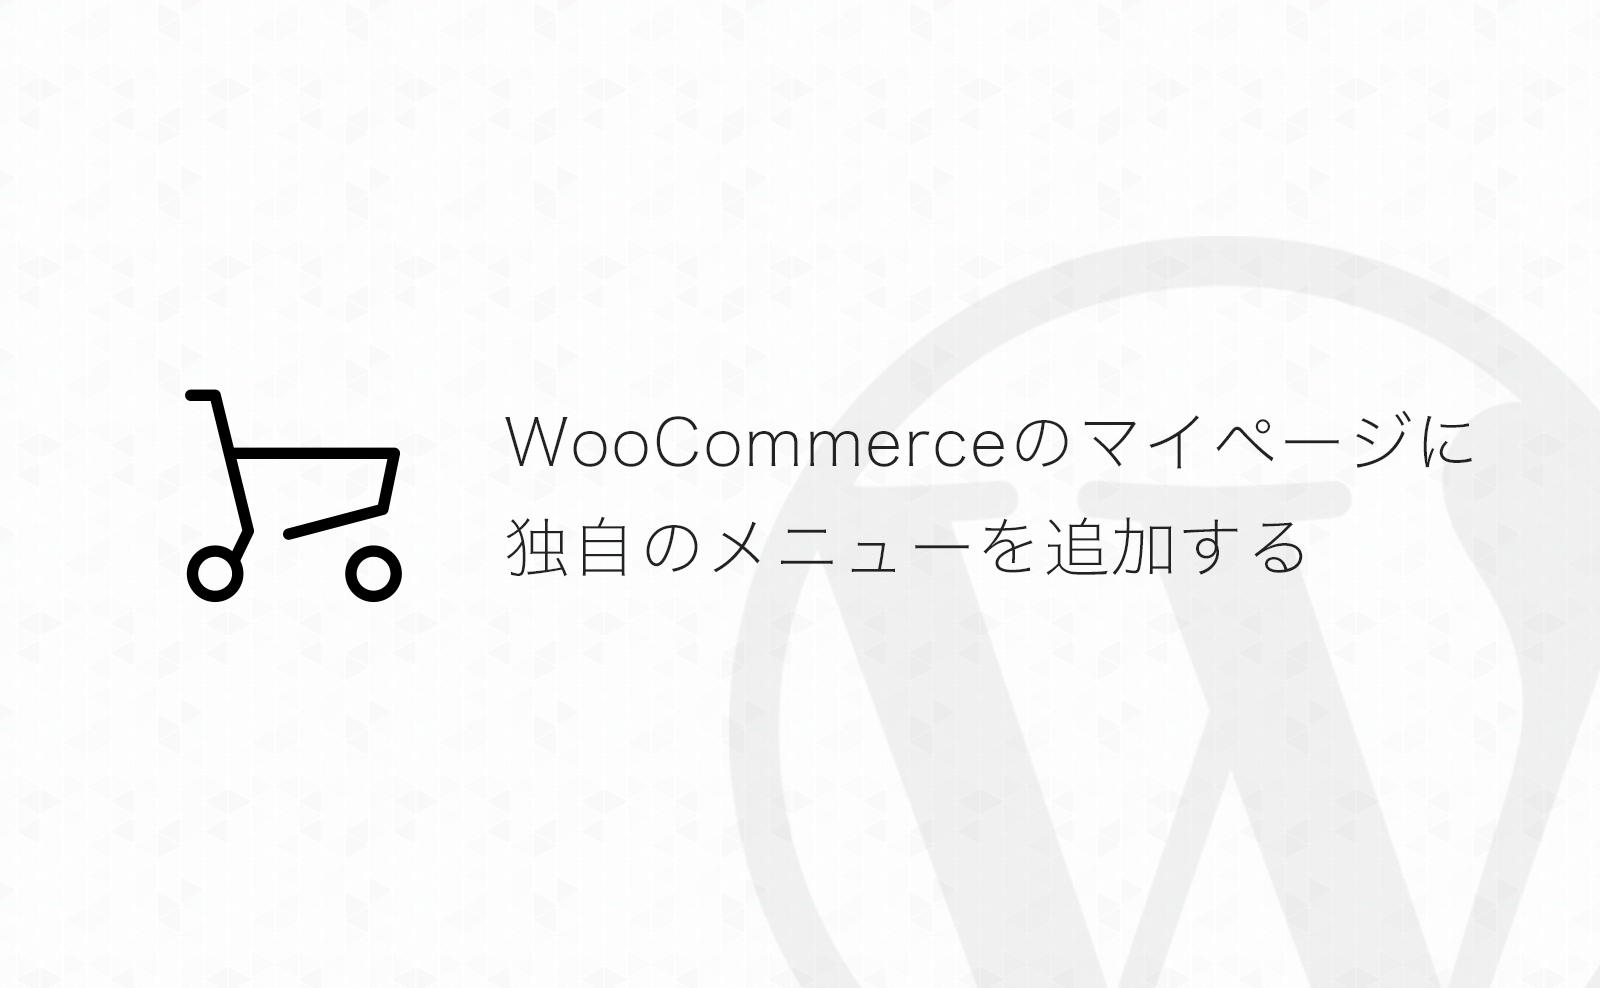 【WooCommerce】マイページに独自のメニューページを追加する方法